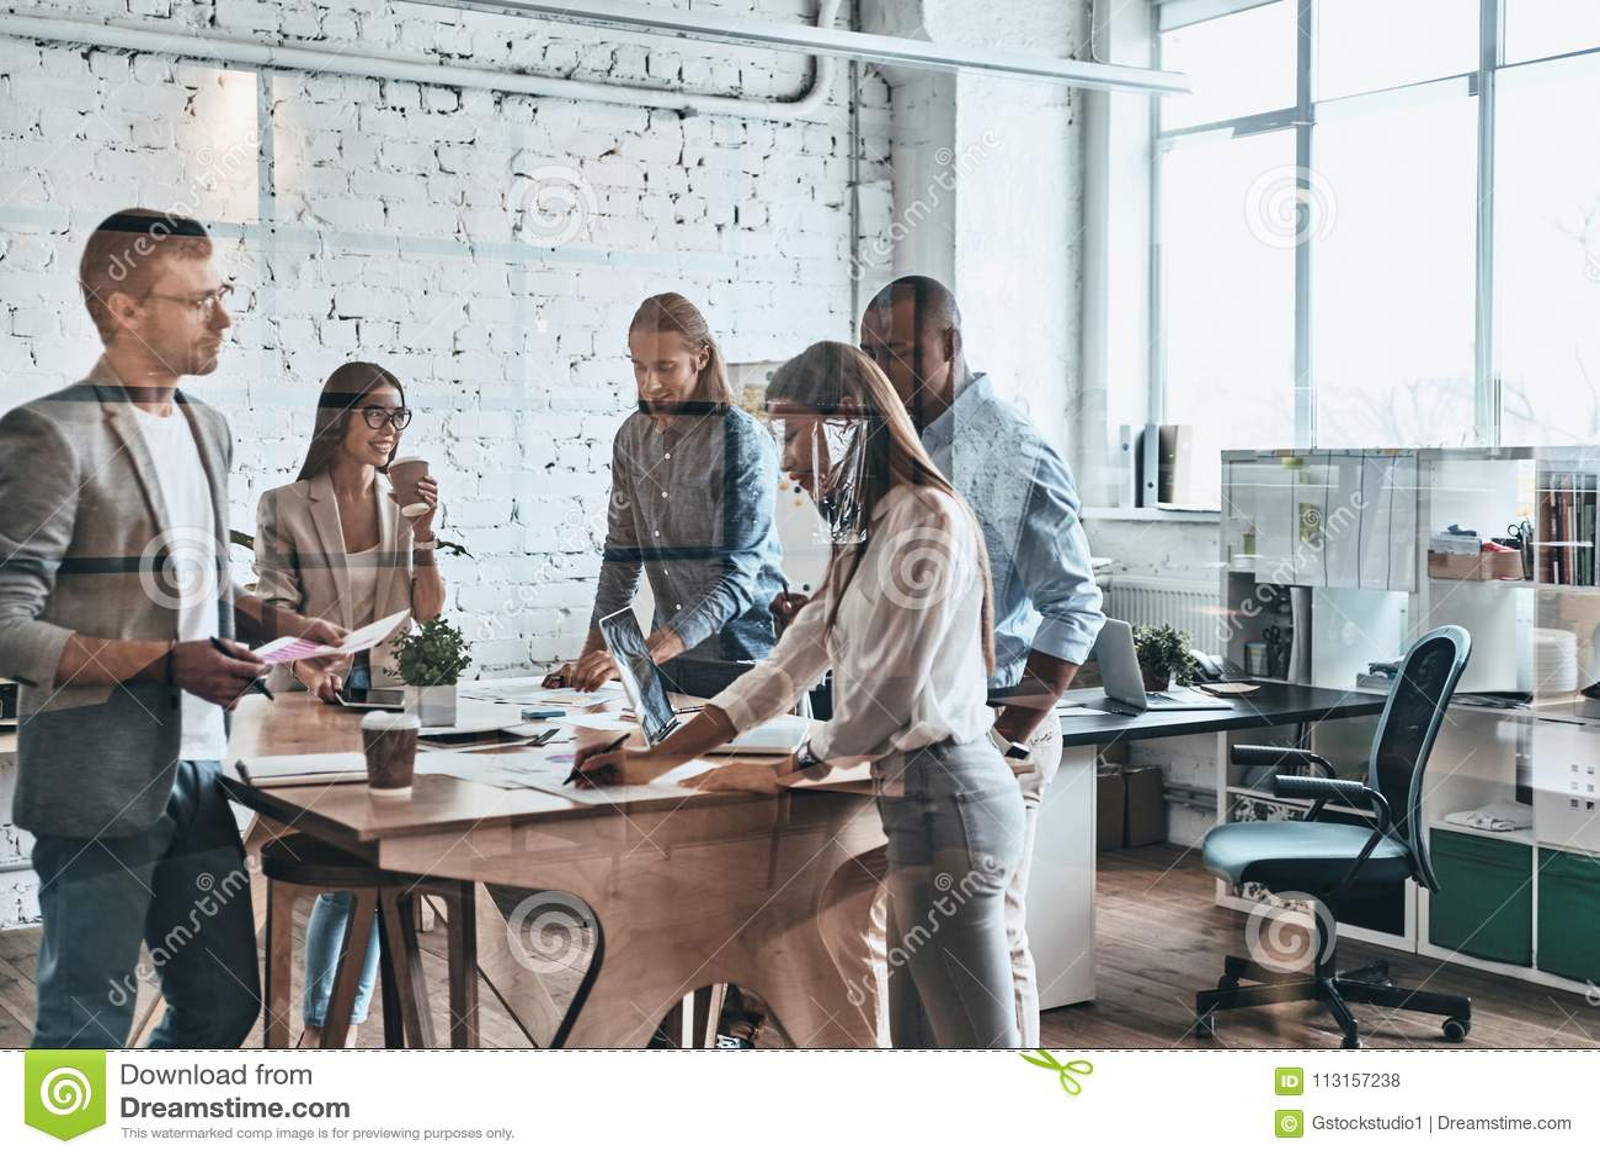 Team op het werk Groep jonge moderne mensen in slimme vrijetijdskleding